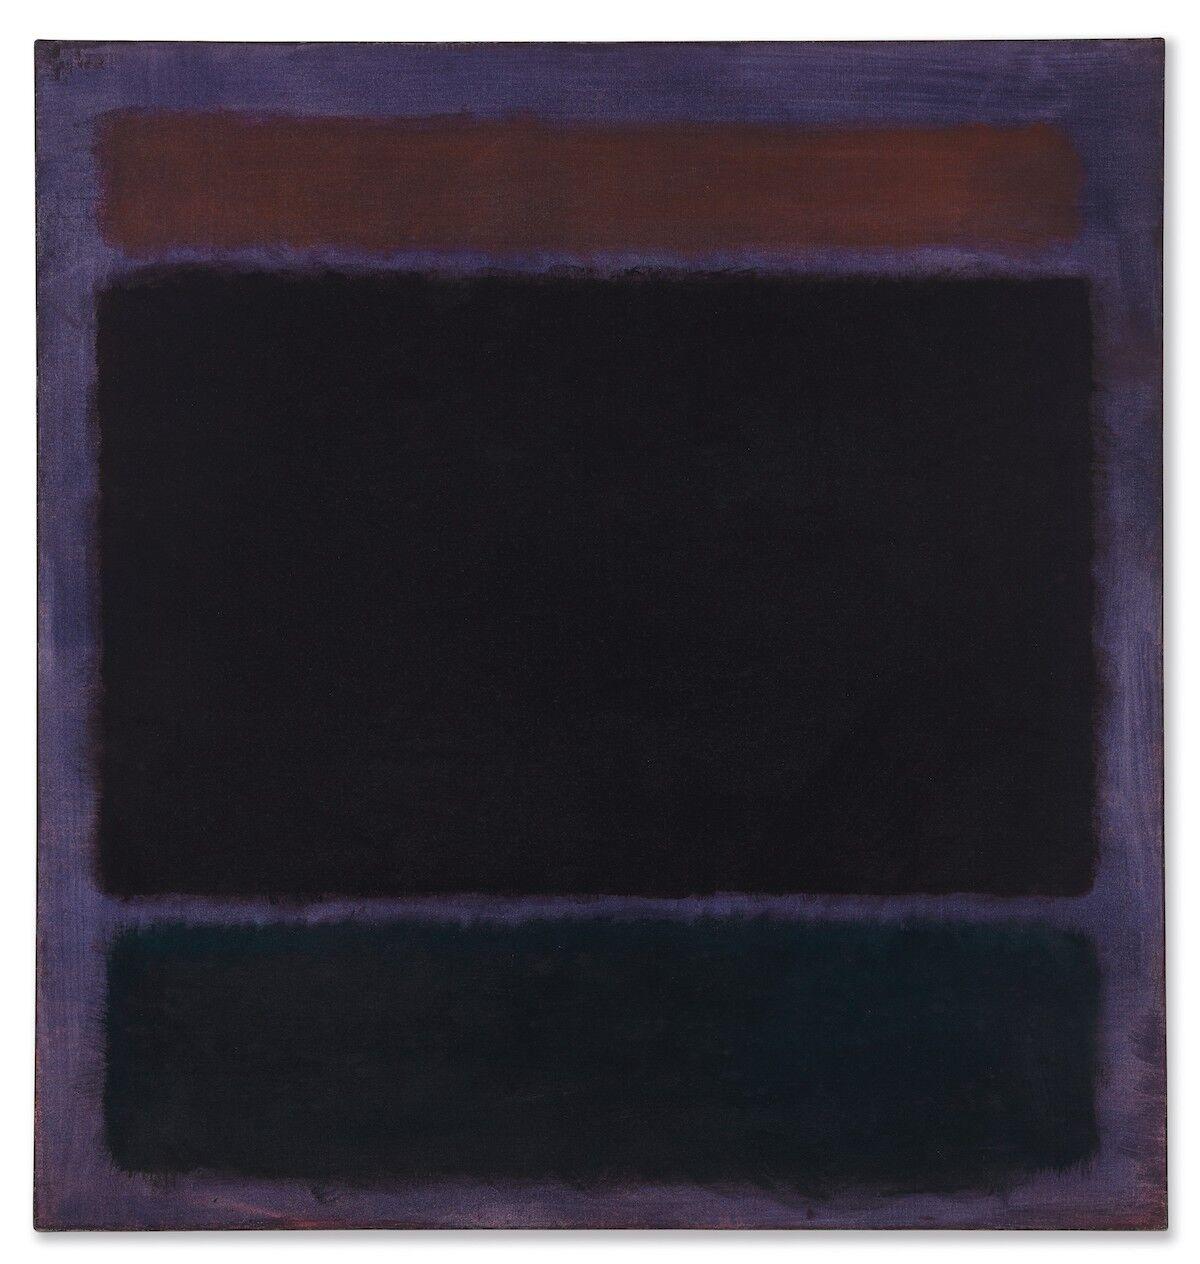 Mark Rothko, Untitled (Rust, Blacks on Plum), 1962. Est. $35–45 million. Courtesy Christie's.